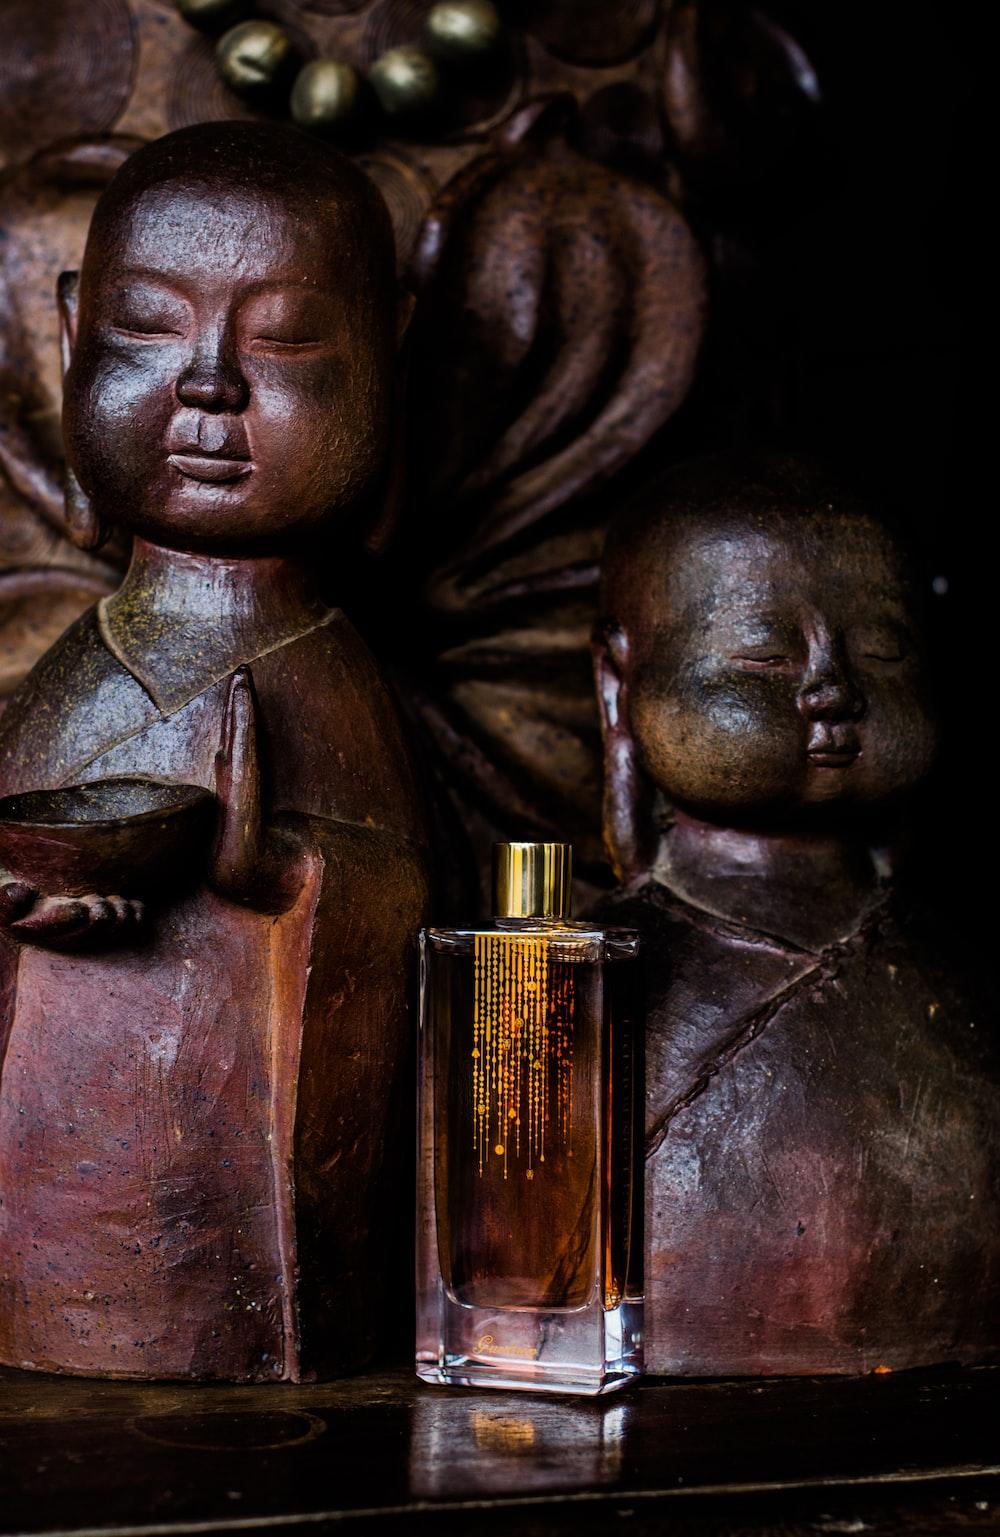 yellow glass fragrance bottle